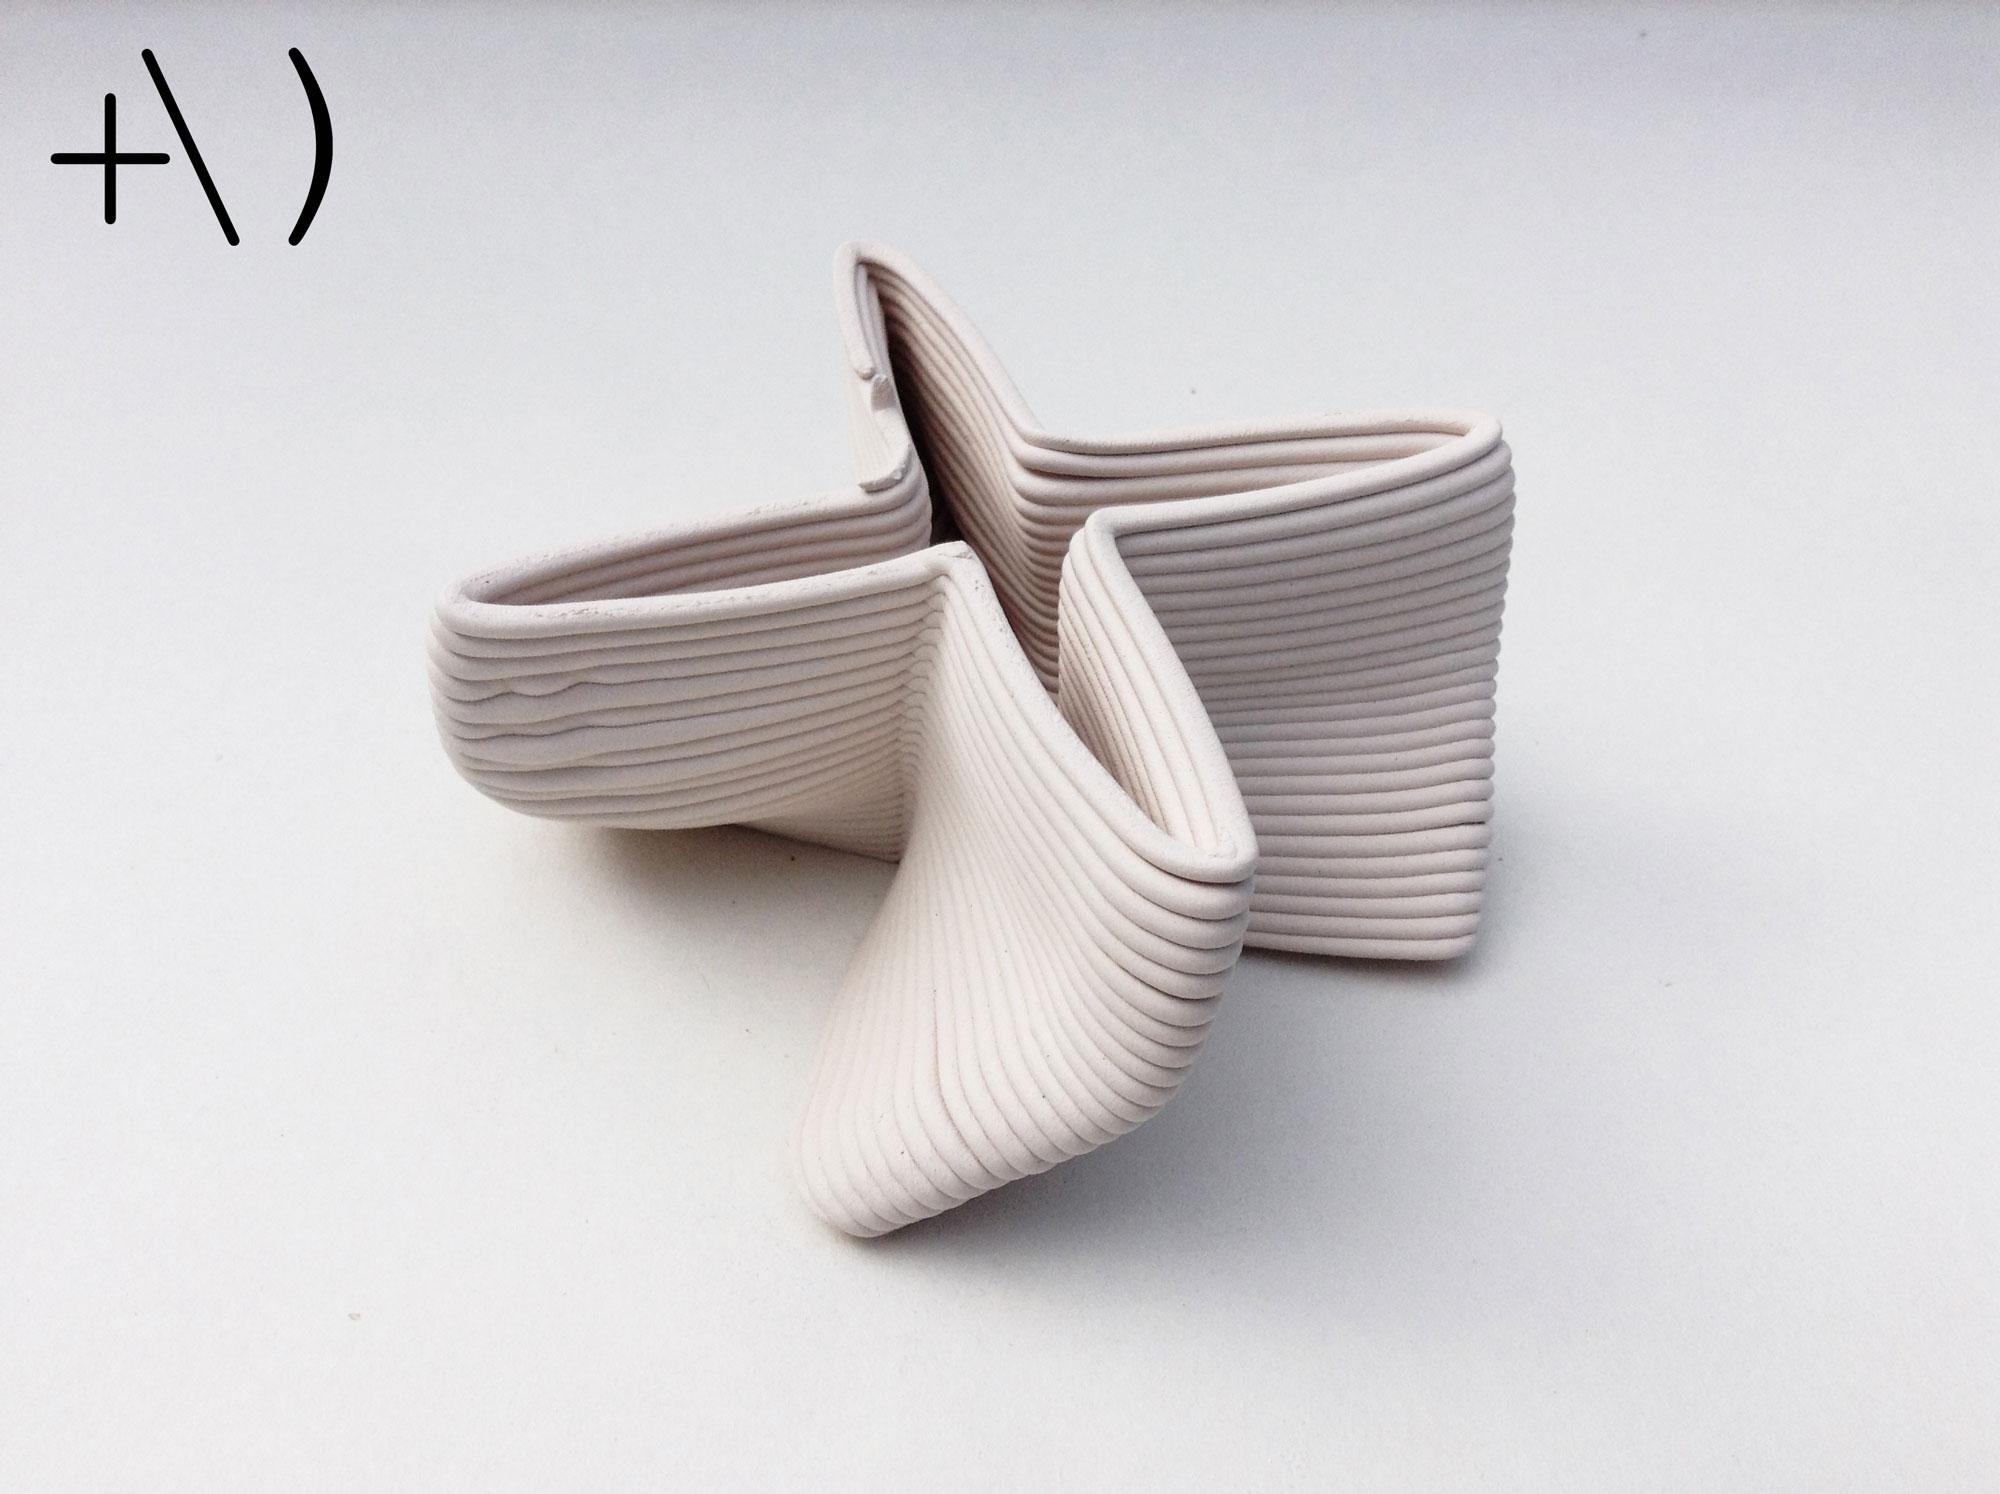 computational clay design super formula torsione